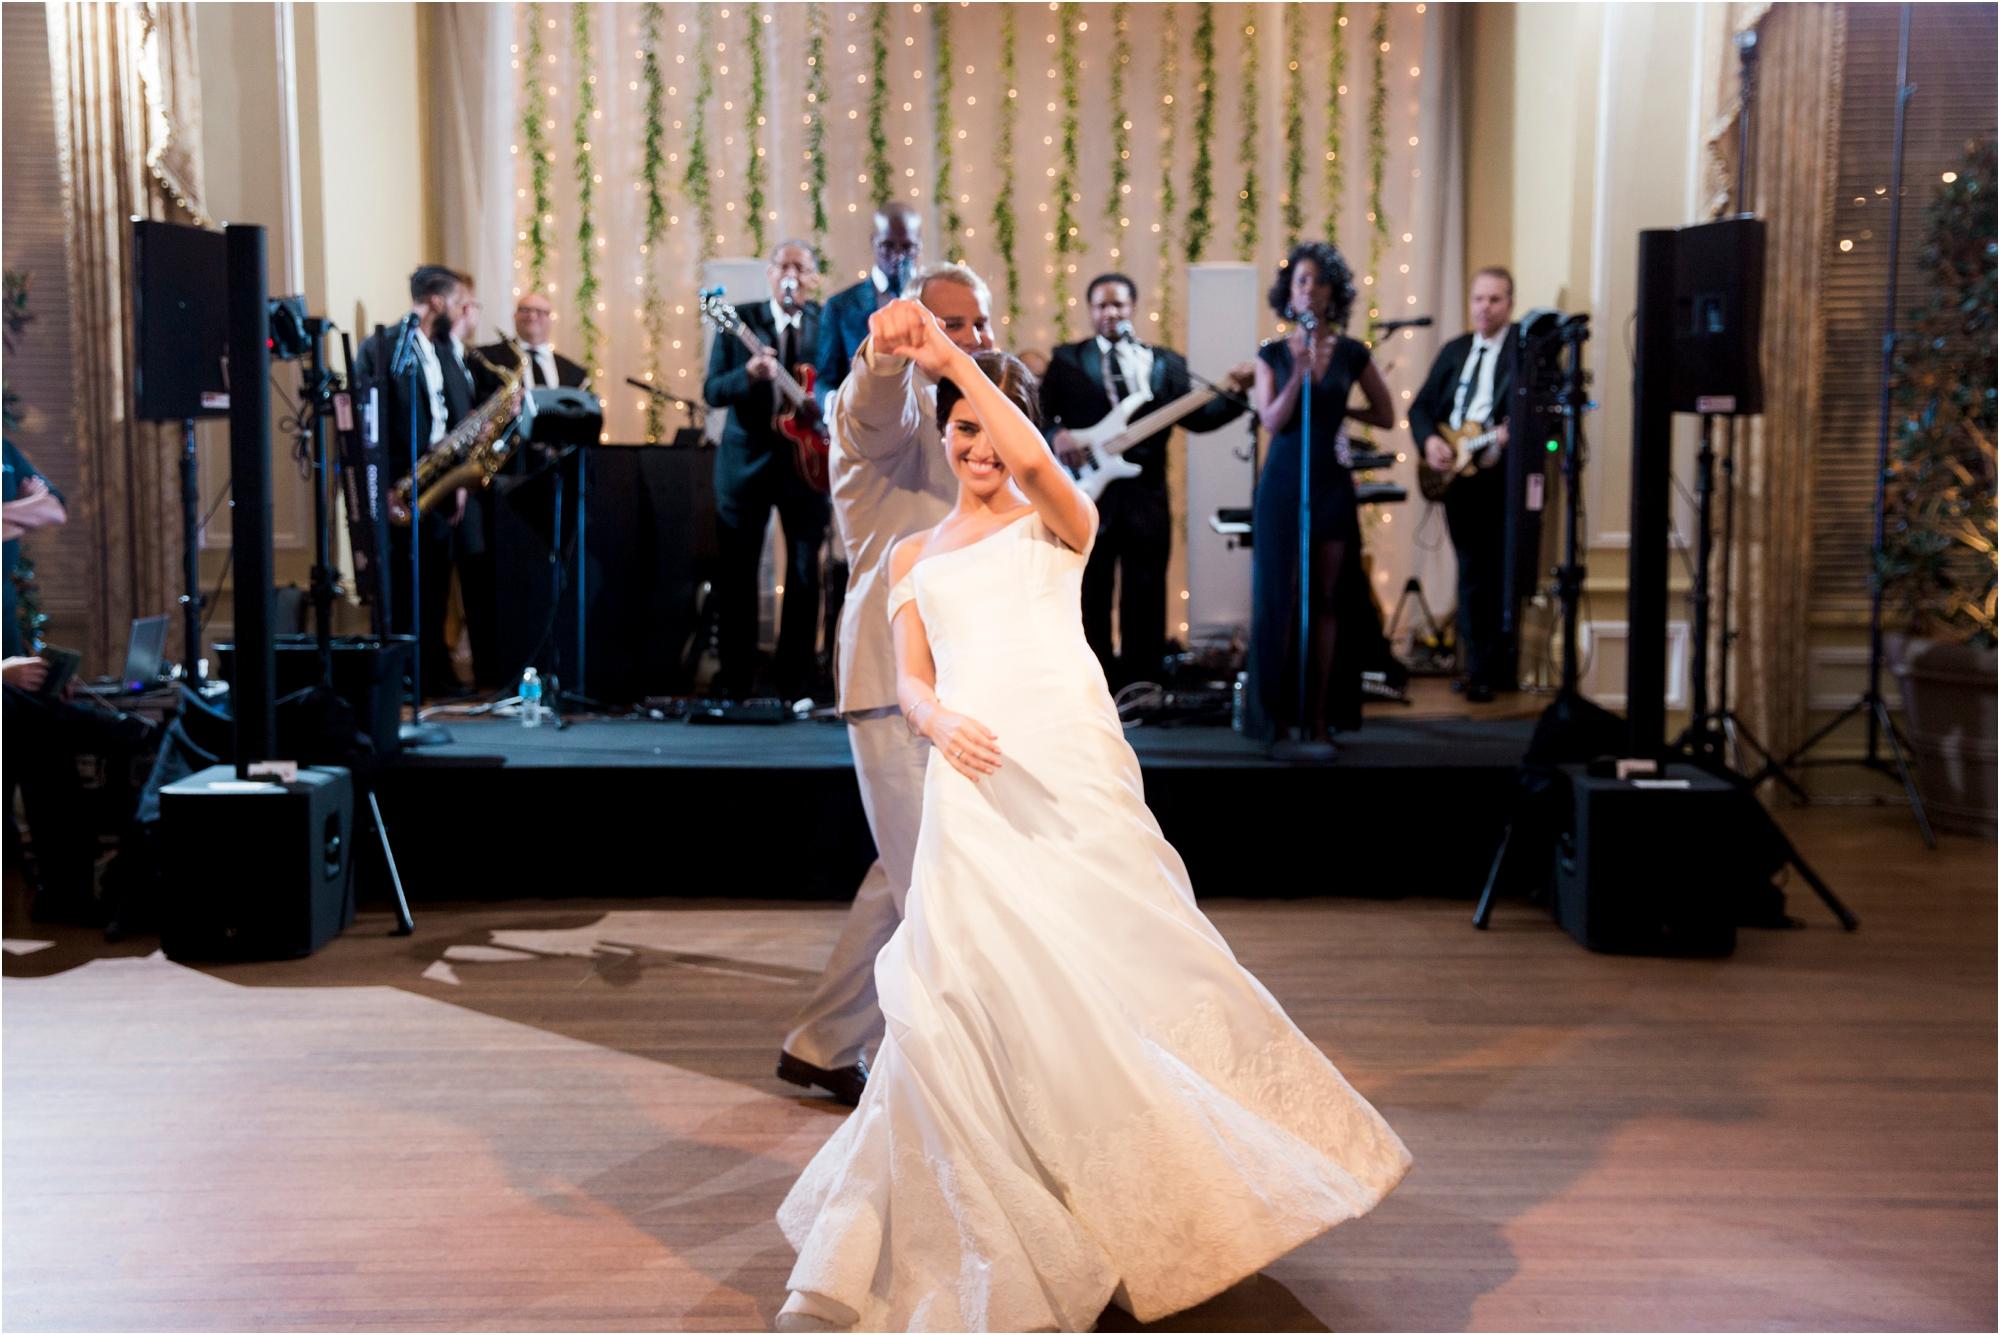 claire-thomas-farmington-country-club-charlottesville-virginia-wedding-photos_0040.jpg